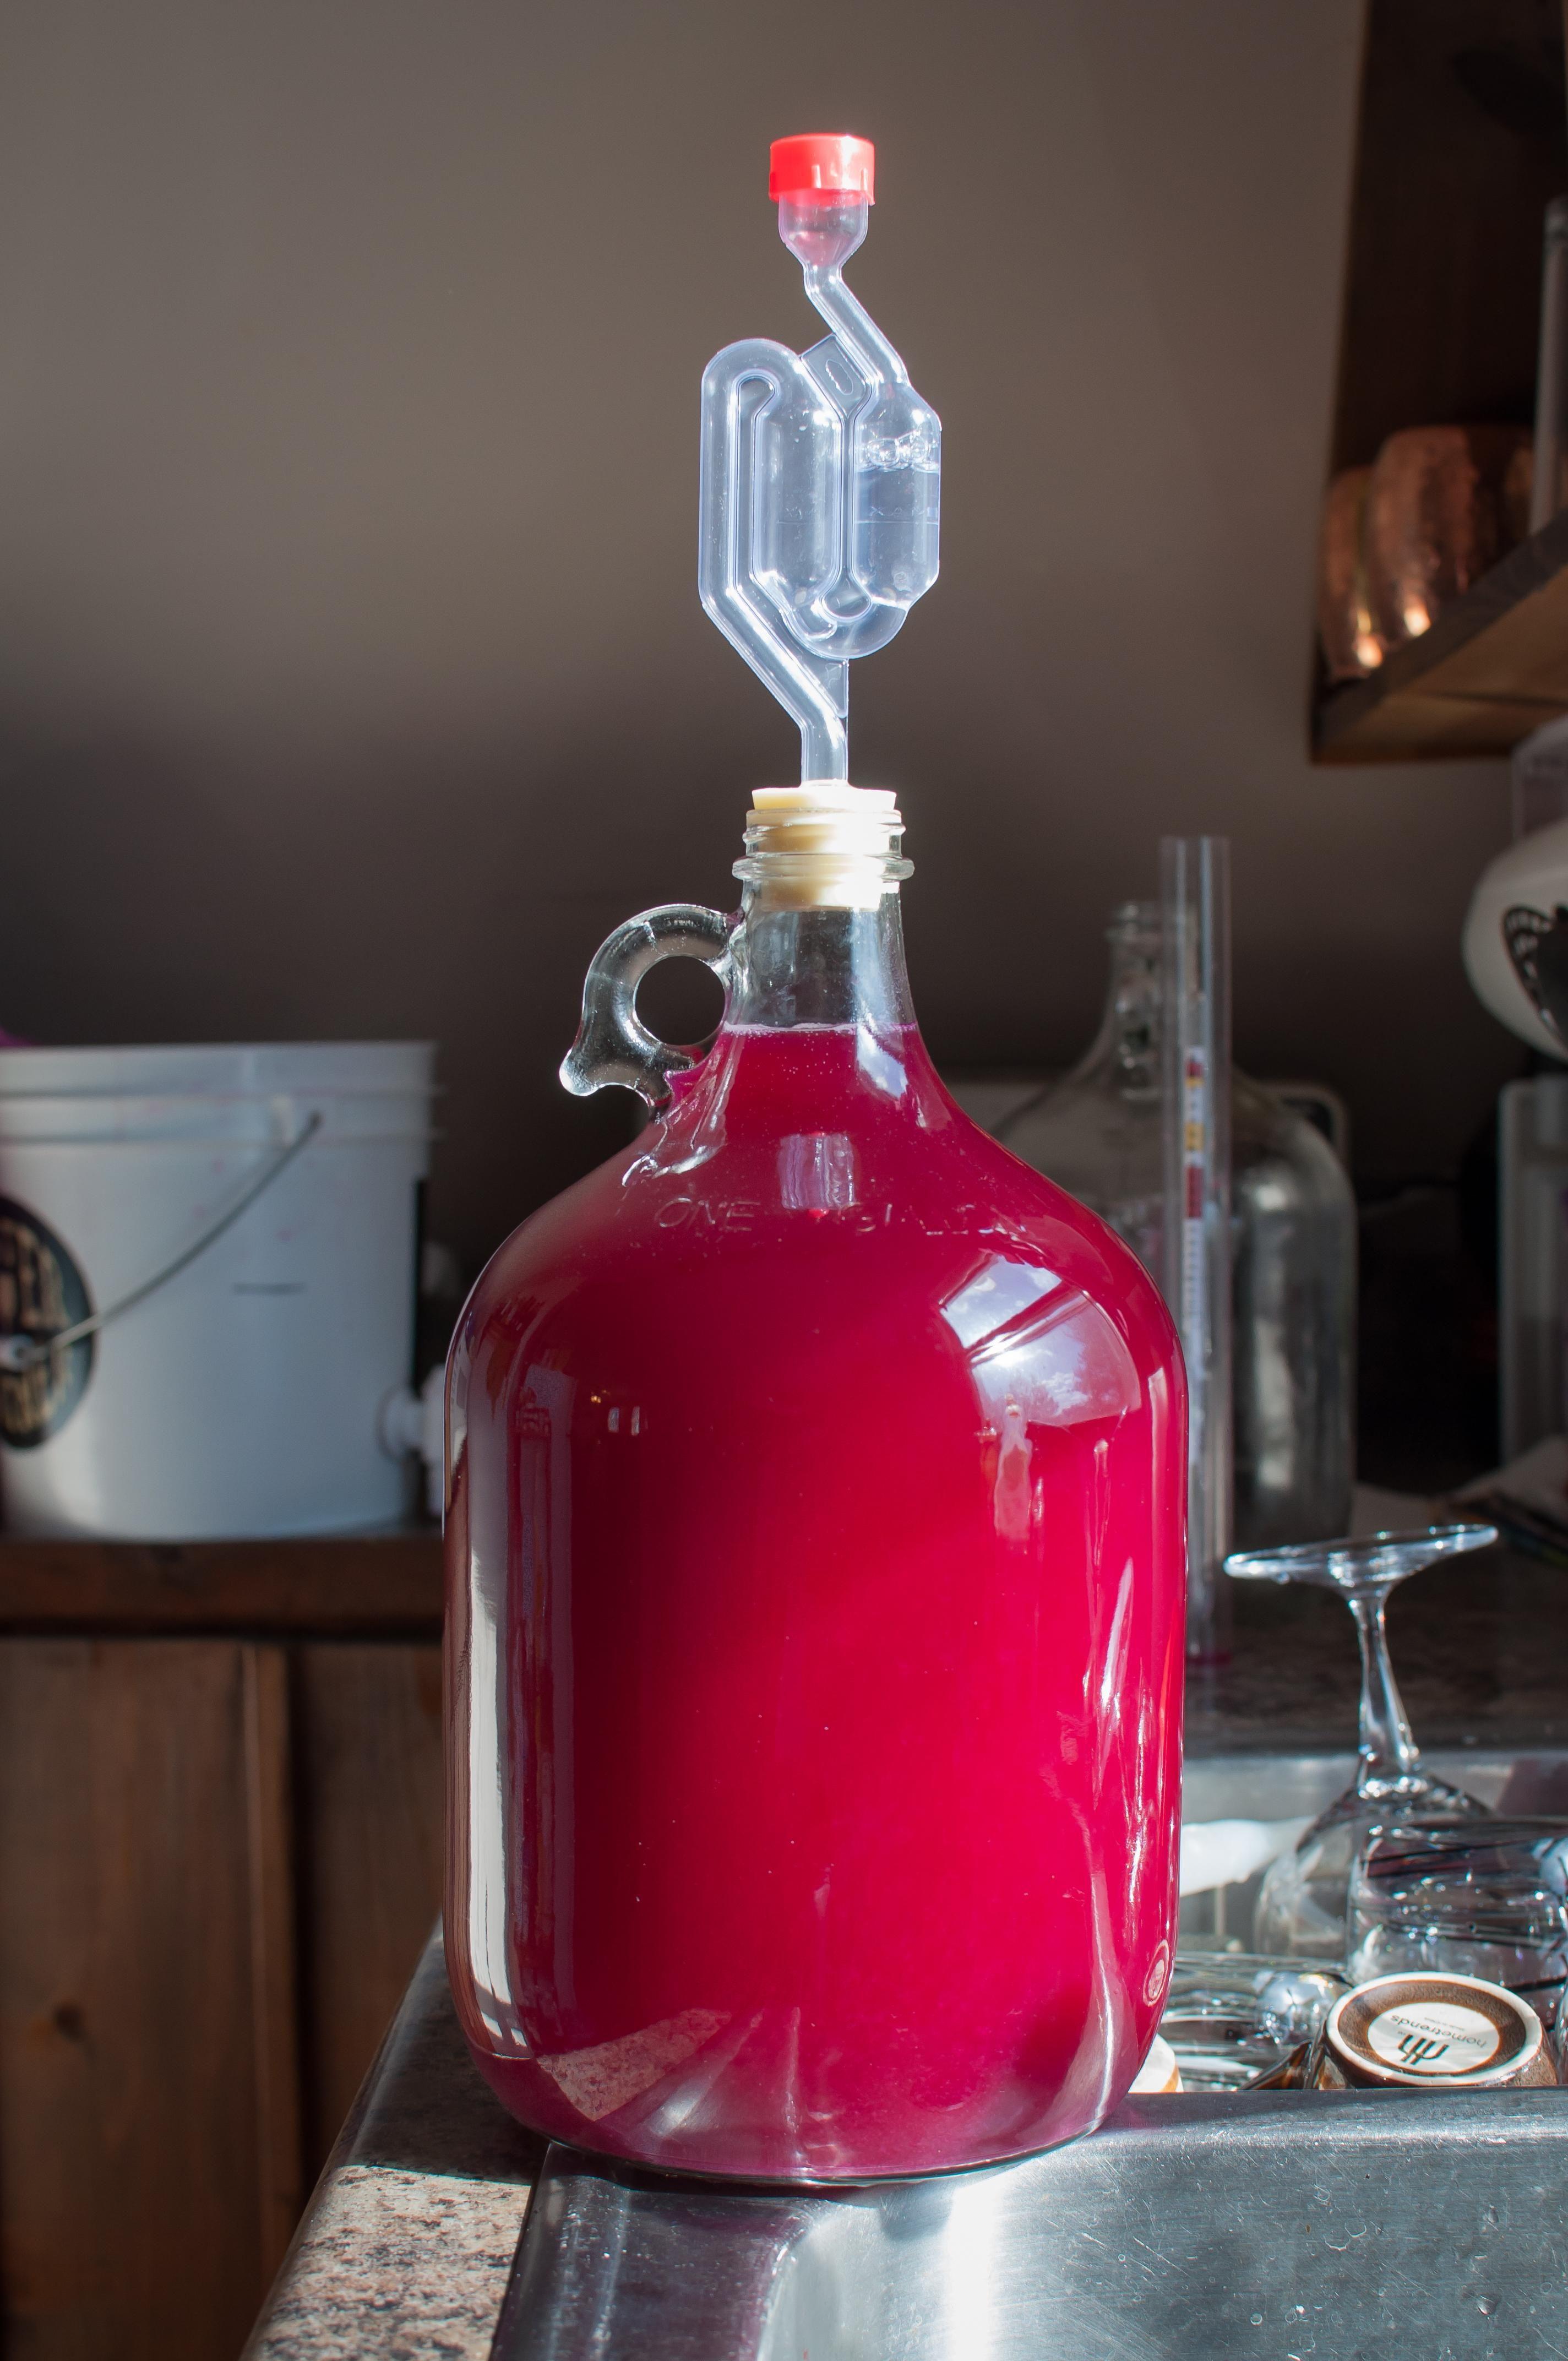 First Prickly Pear Wine Winemaking Wine Winelover Qanda Winery Winelife Winetasting Step Winewednesday Home Pear Wine Apple Wine Homemade Wine Making